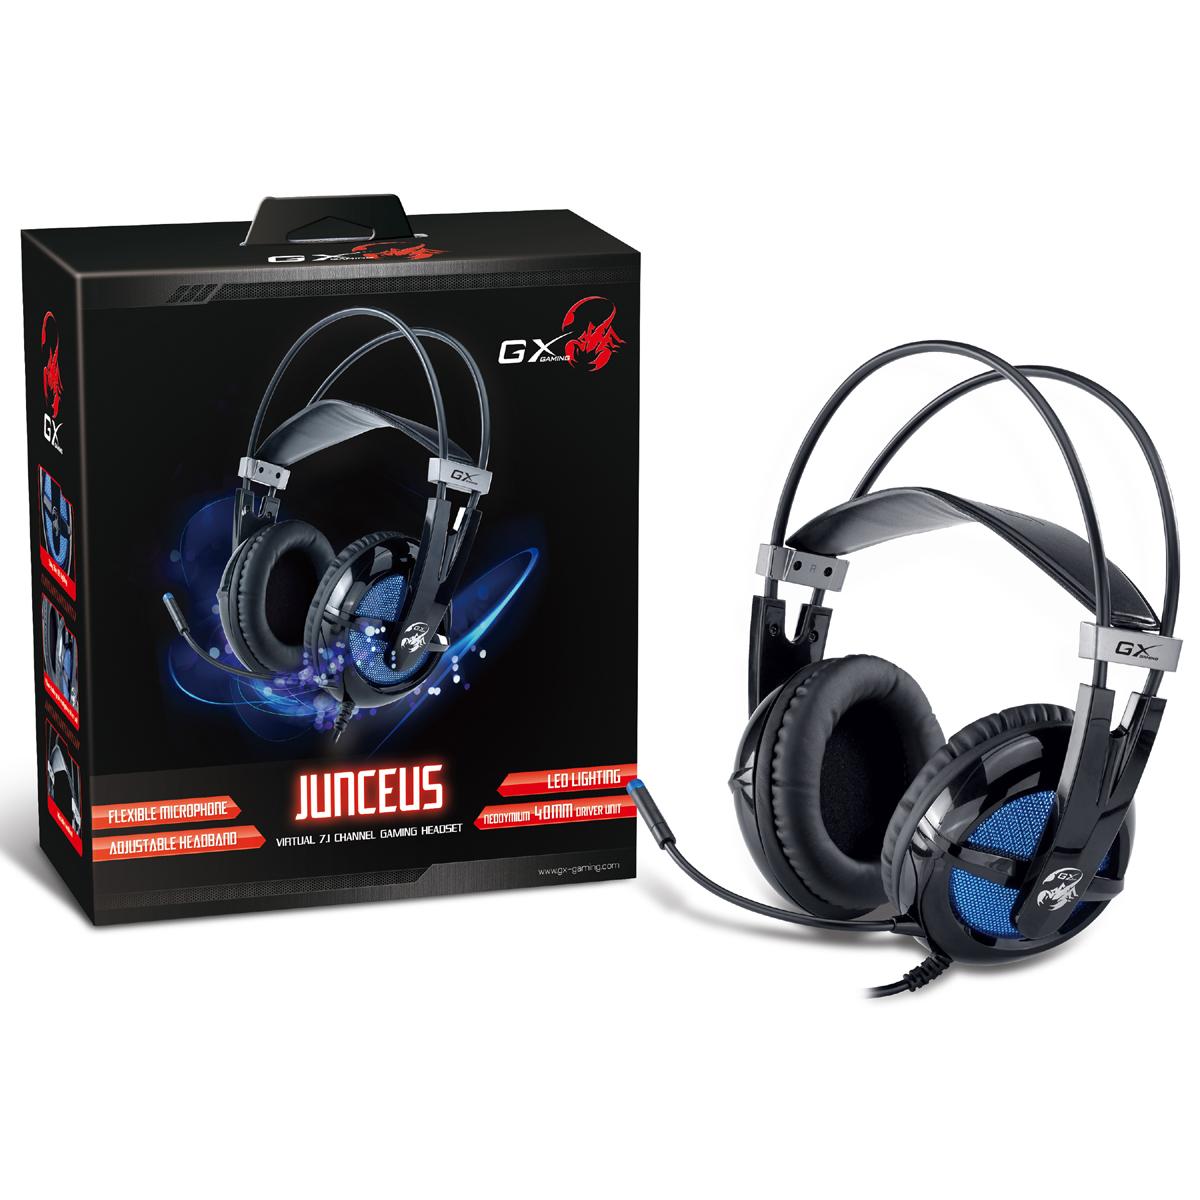 GX Gaming Virtual 7.1- Channel Junceus Gaming Headset HS-G650 - Black